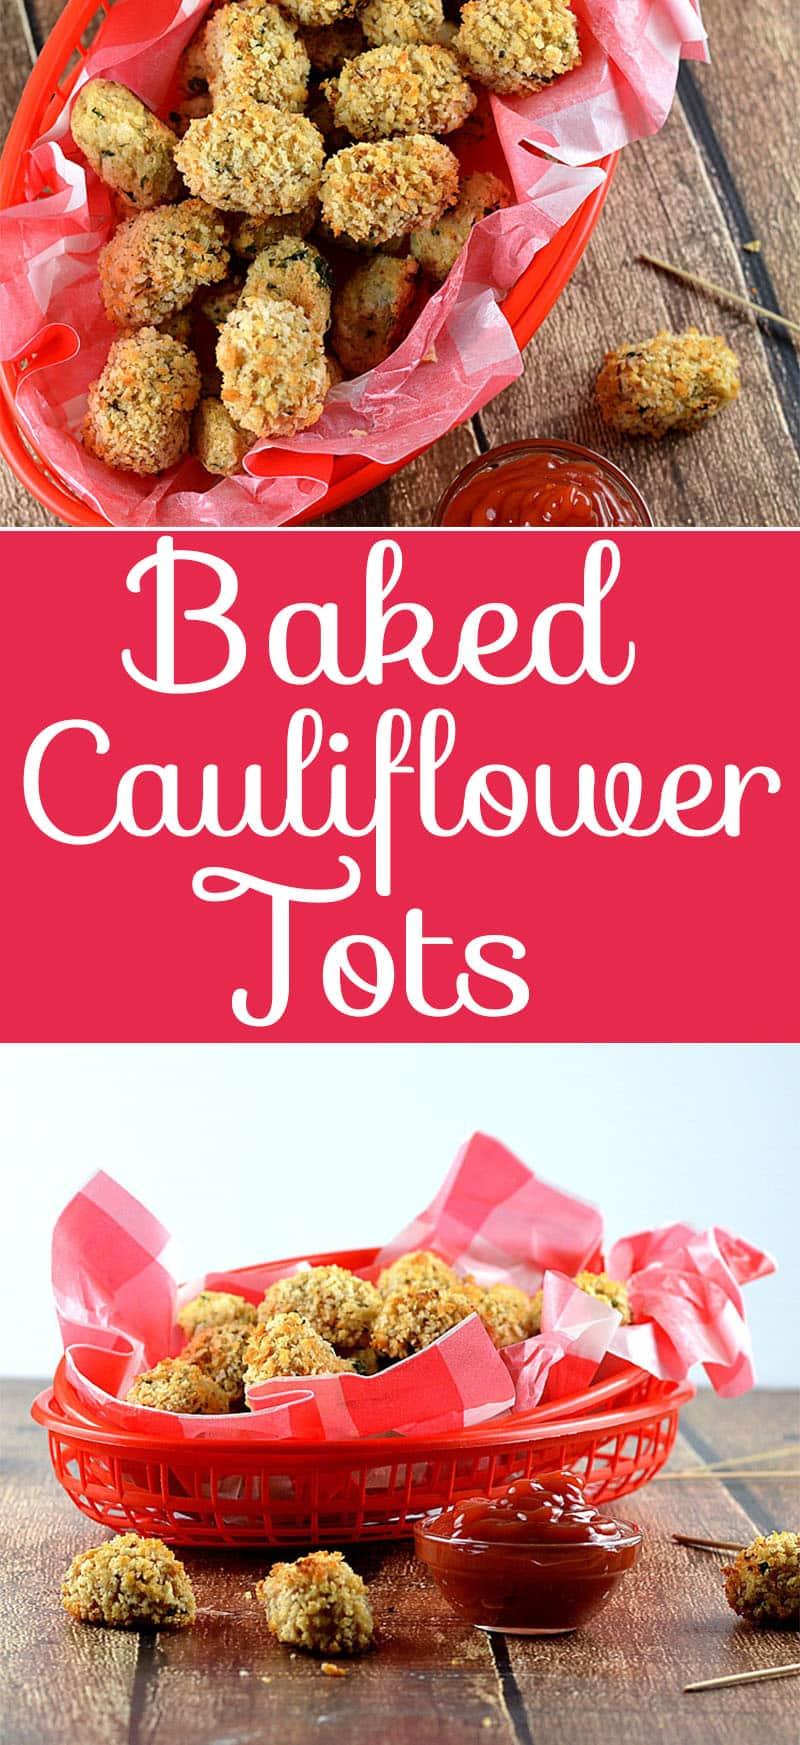 baked-cauliflower-tots